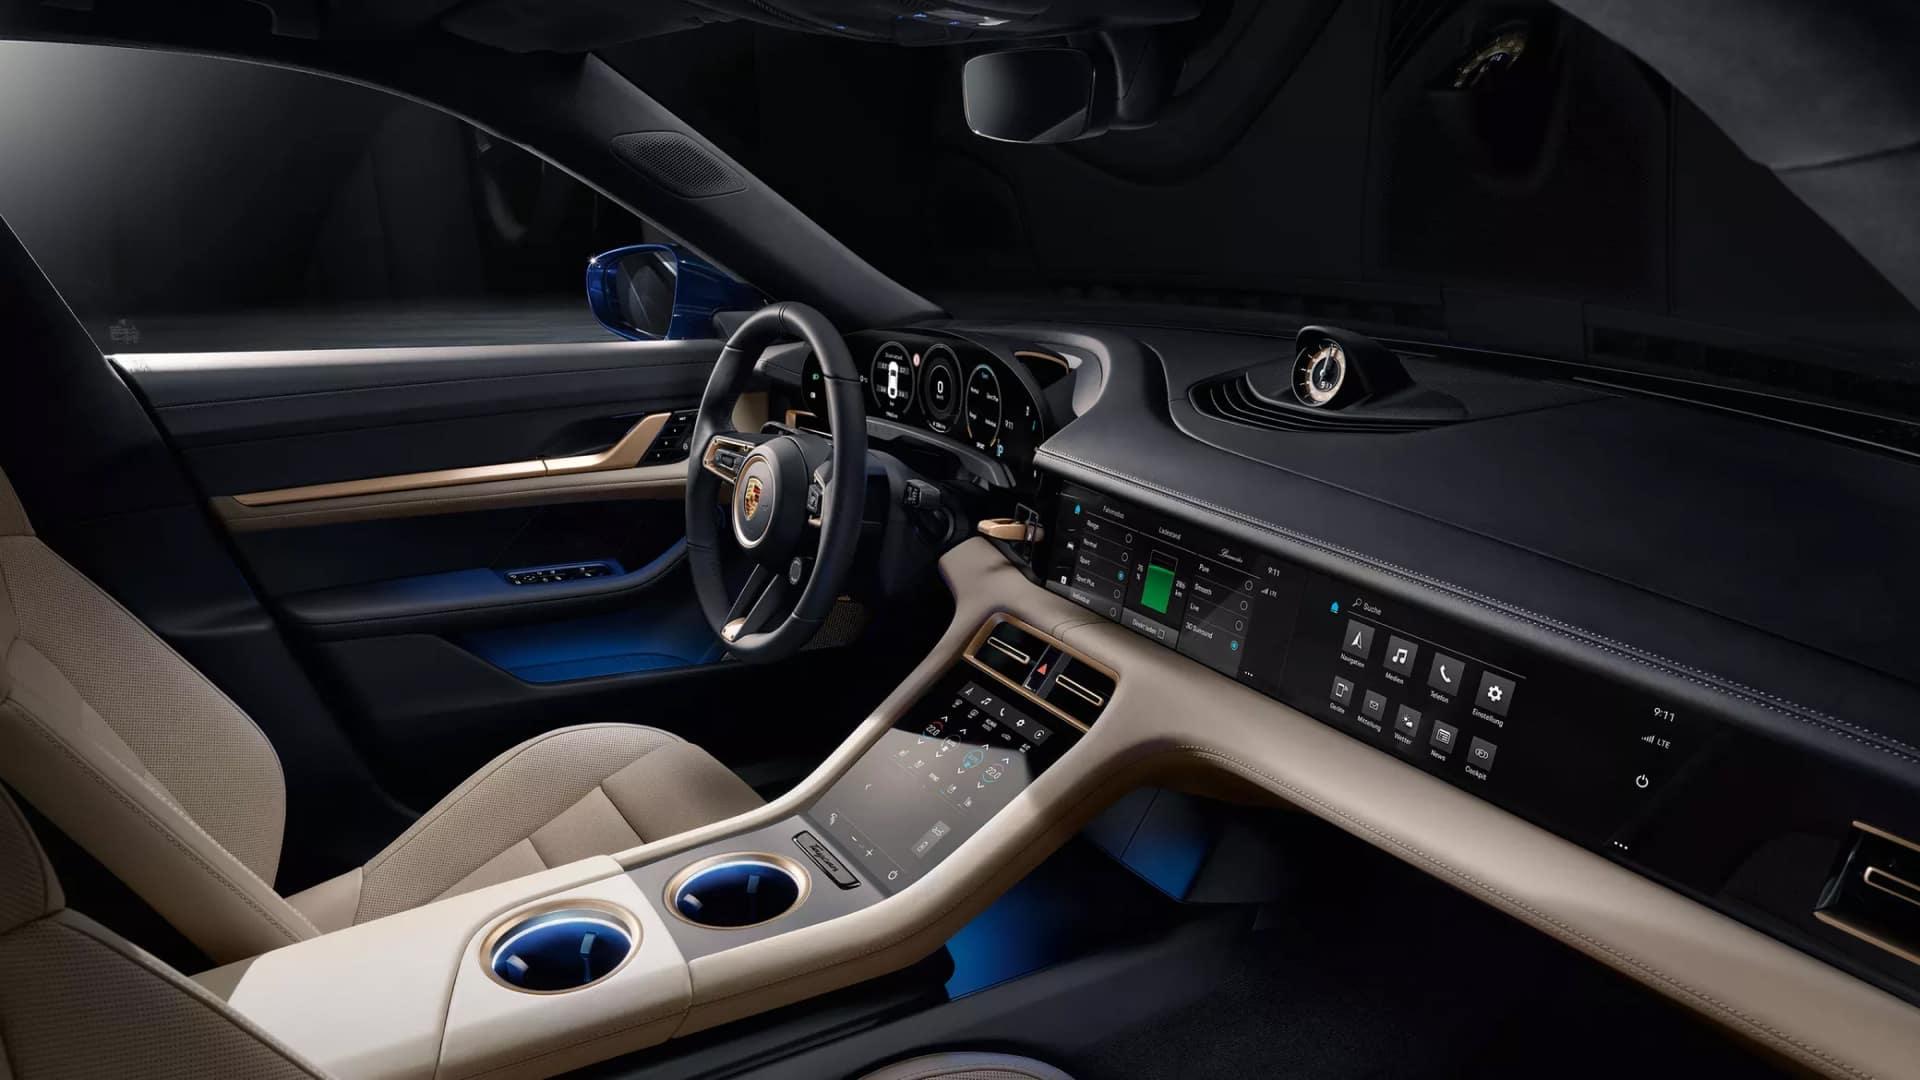 2020 Porsche Taycan Technology